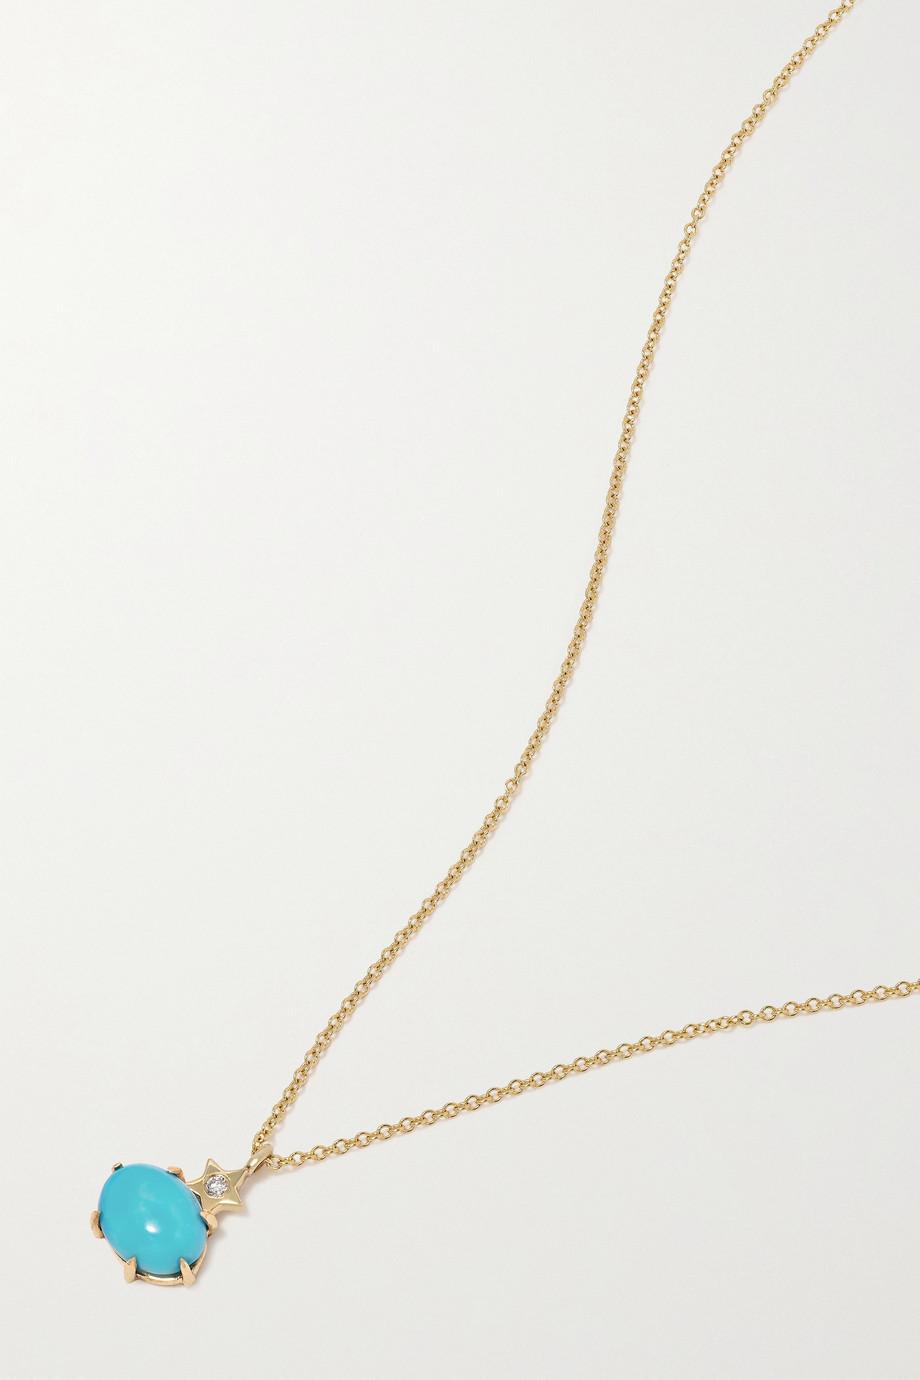 Andrea Fohrman Mini Cosmo Kette aus 14 Karat Gold mit Türkis und Diamant